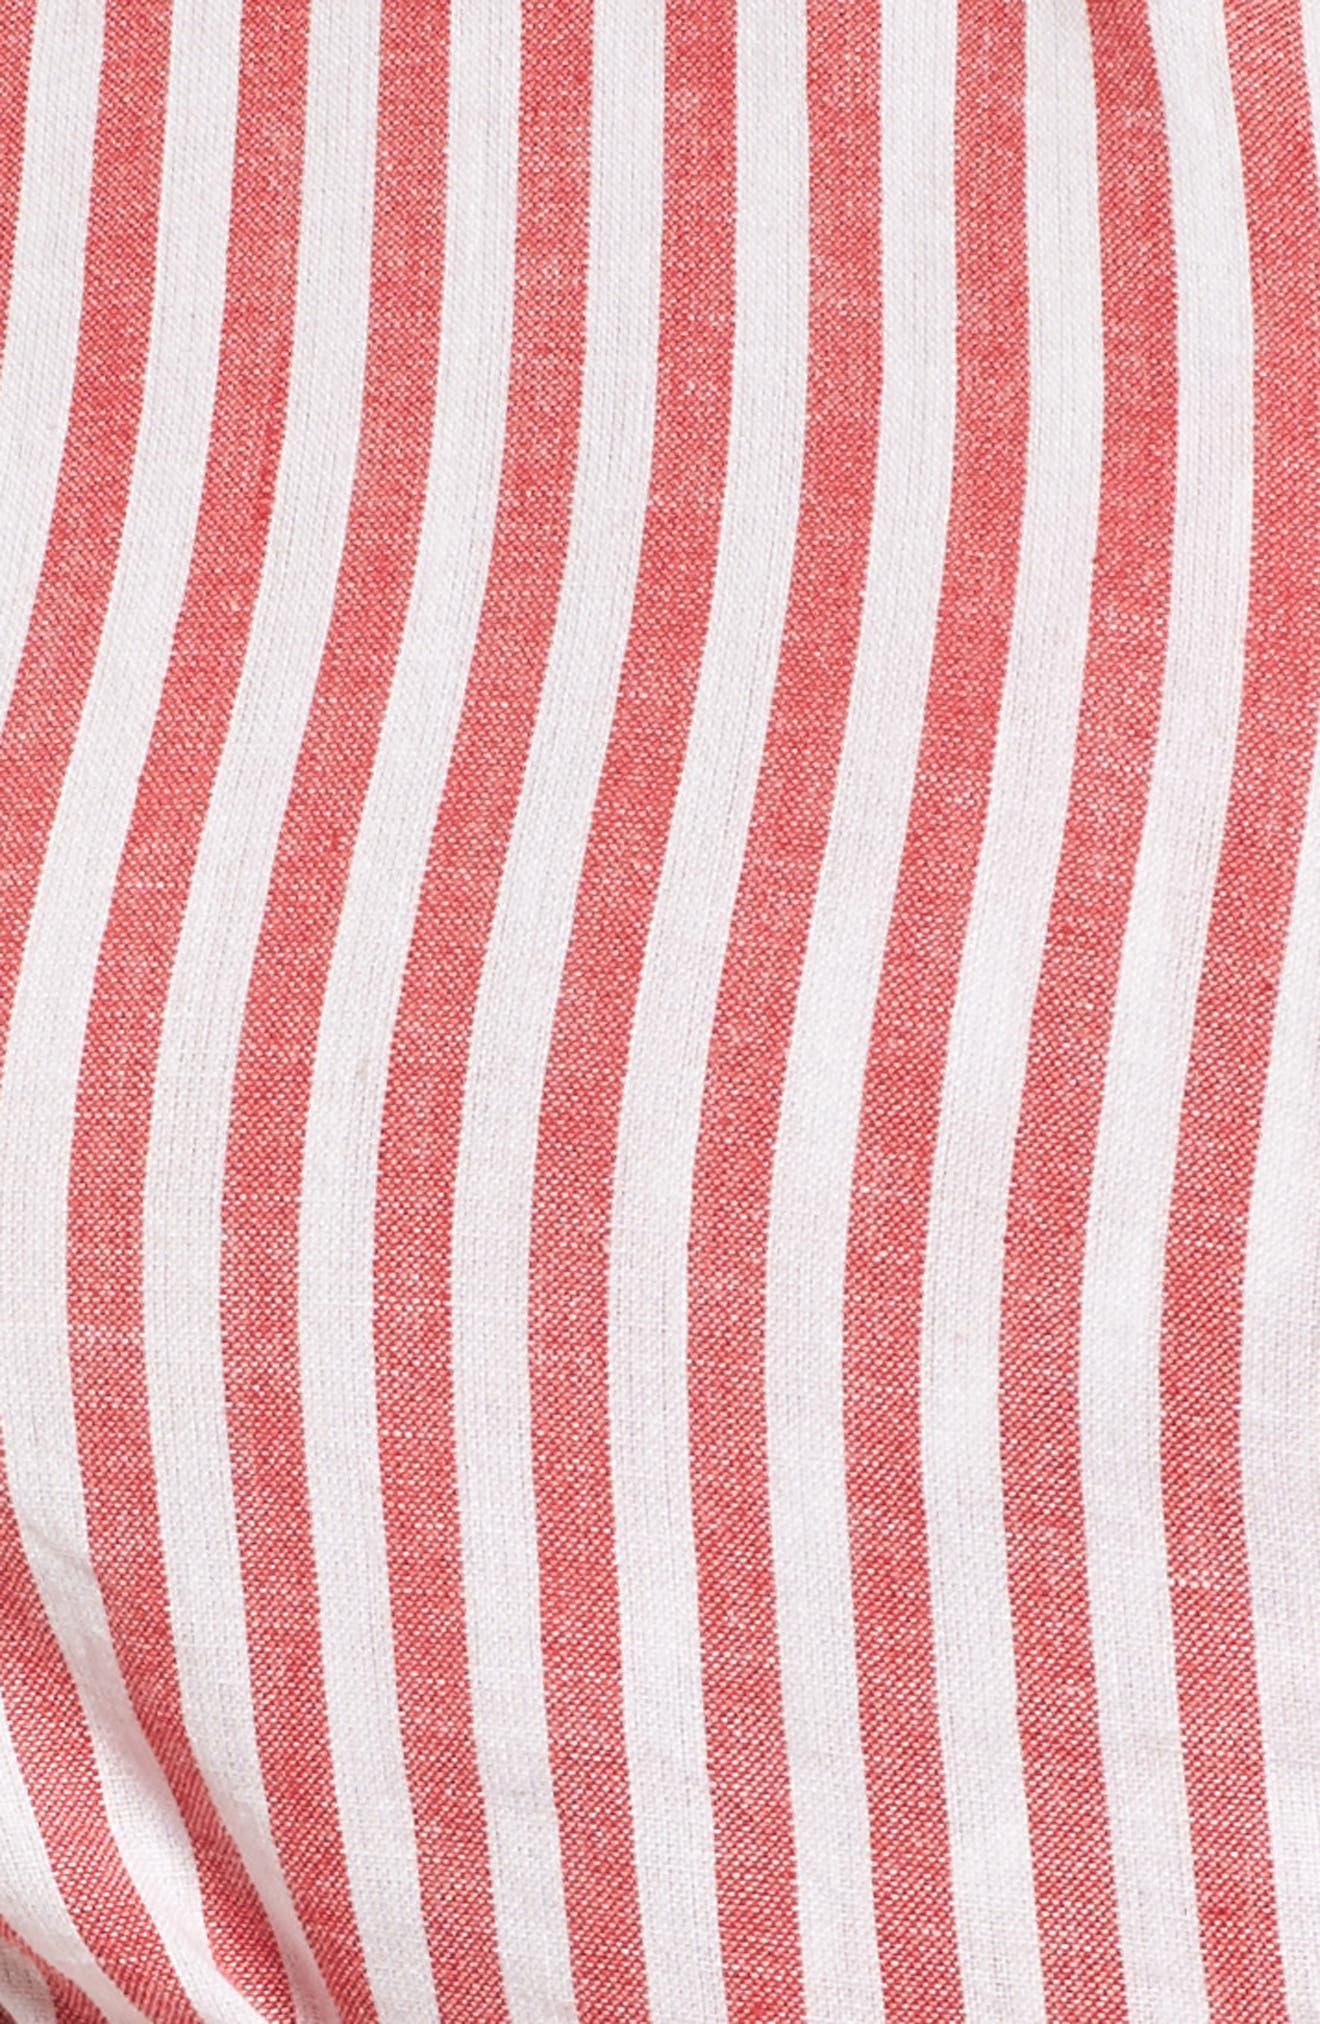 L'Academie Reckless One-Shoulder Wrap Blouse,                             Alternate thumbnail 5, color,                             Red/ White Stripe